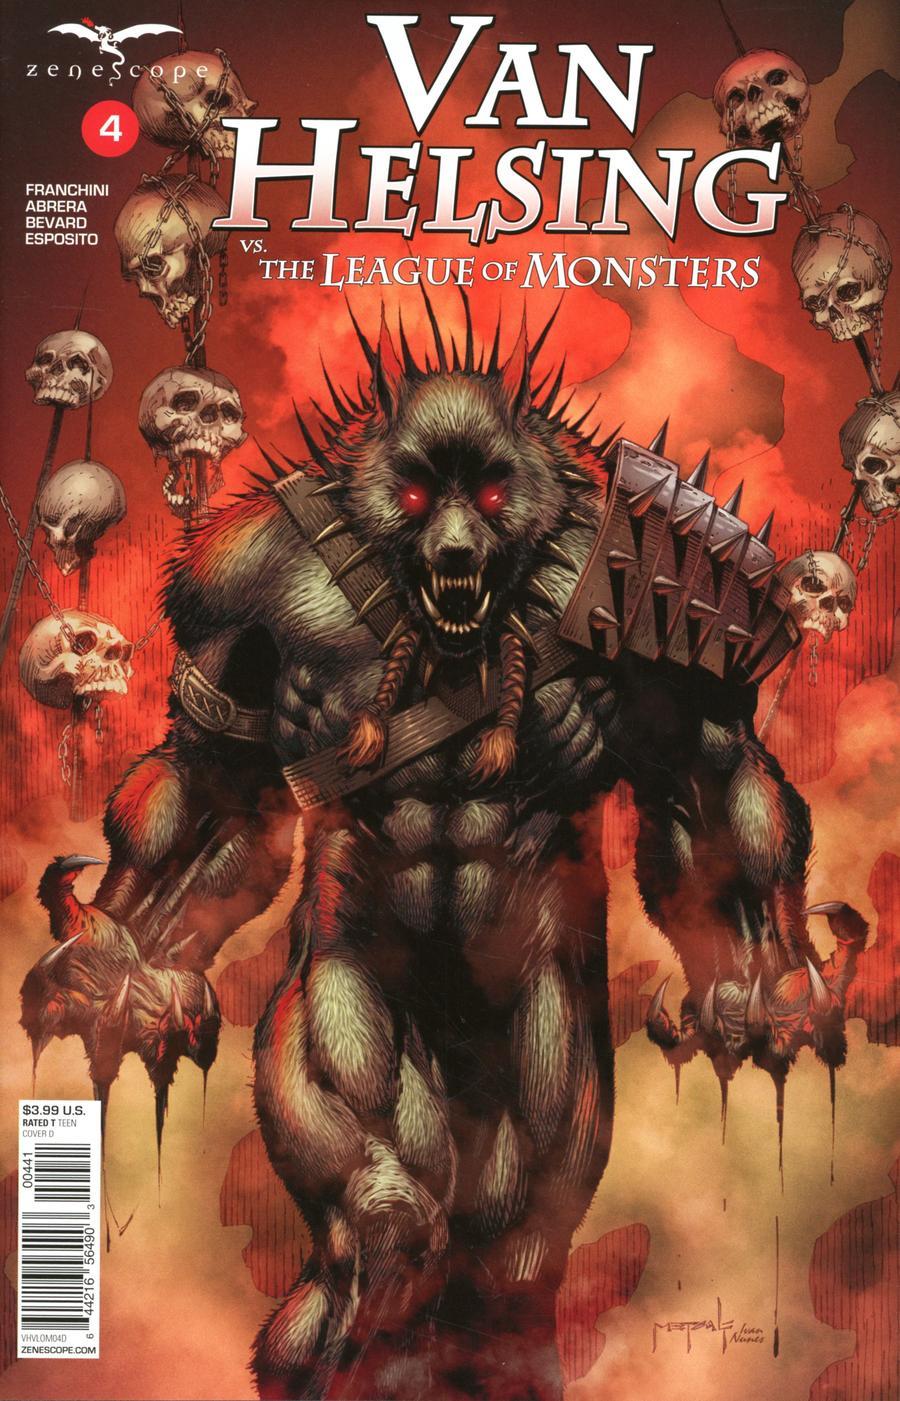 Grimm Fairy Tales Presents Van Helsing vs The League Of Monsters #4 Cover D Jason Metcalf